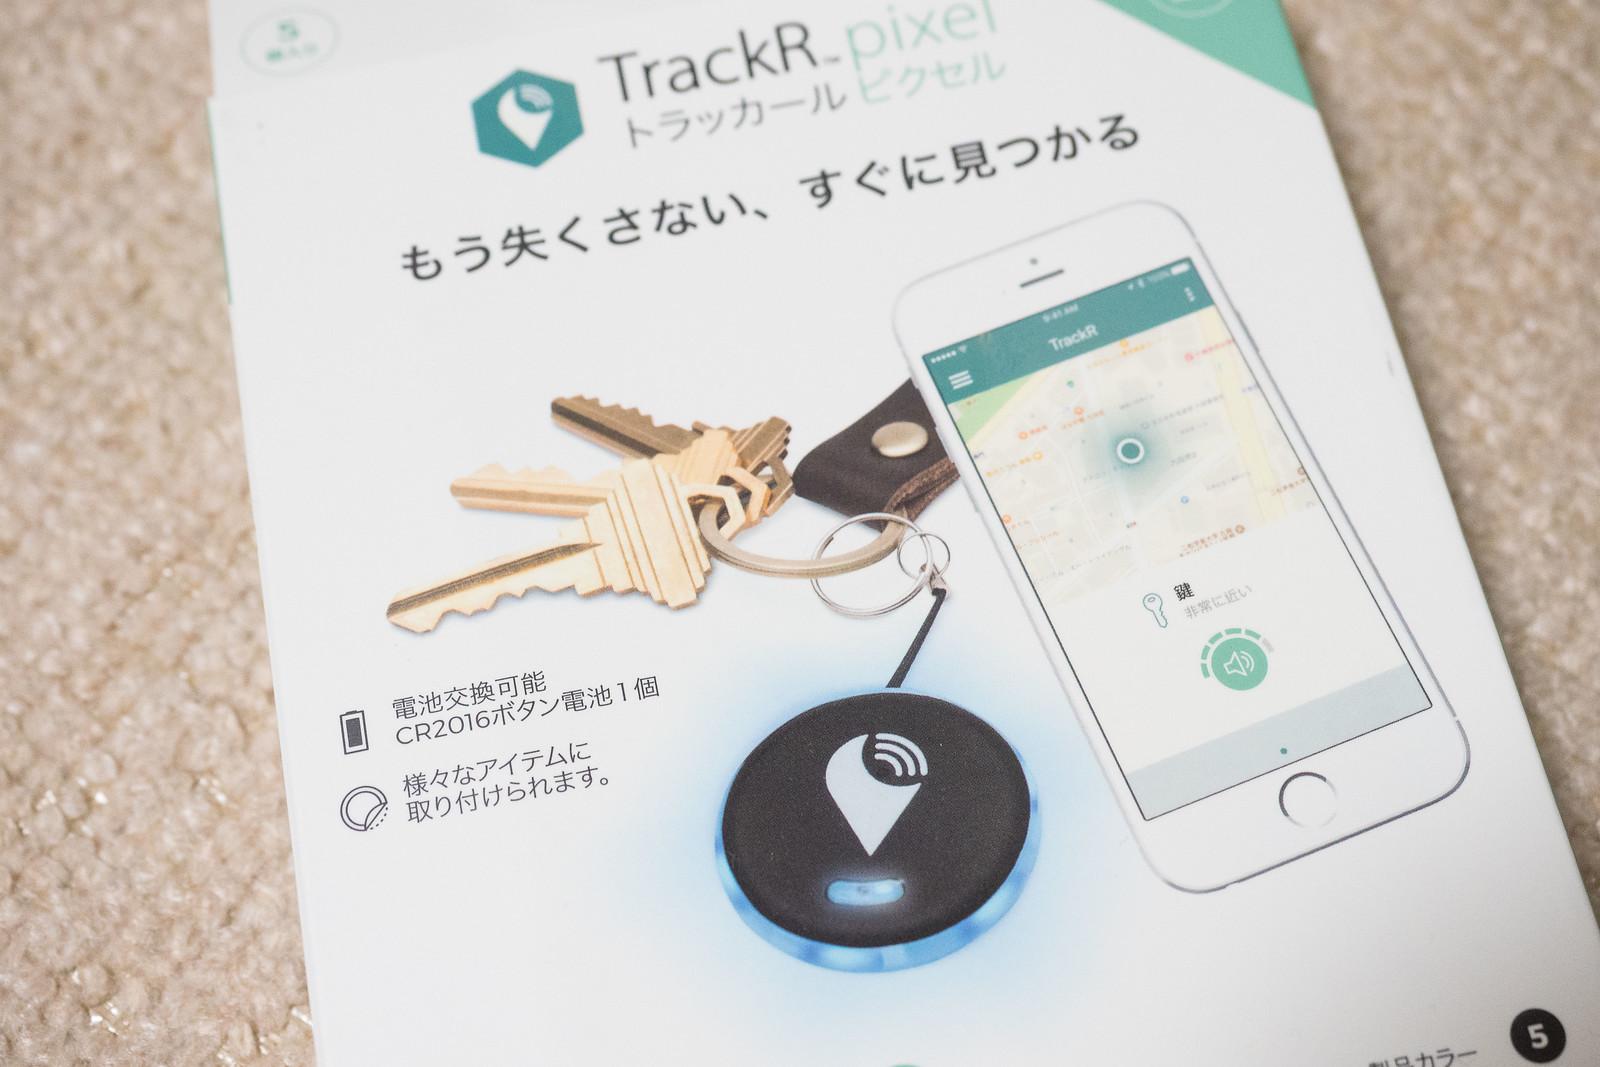 TrackR_pixel-5